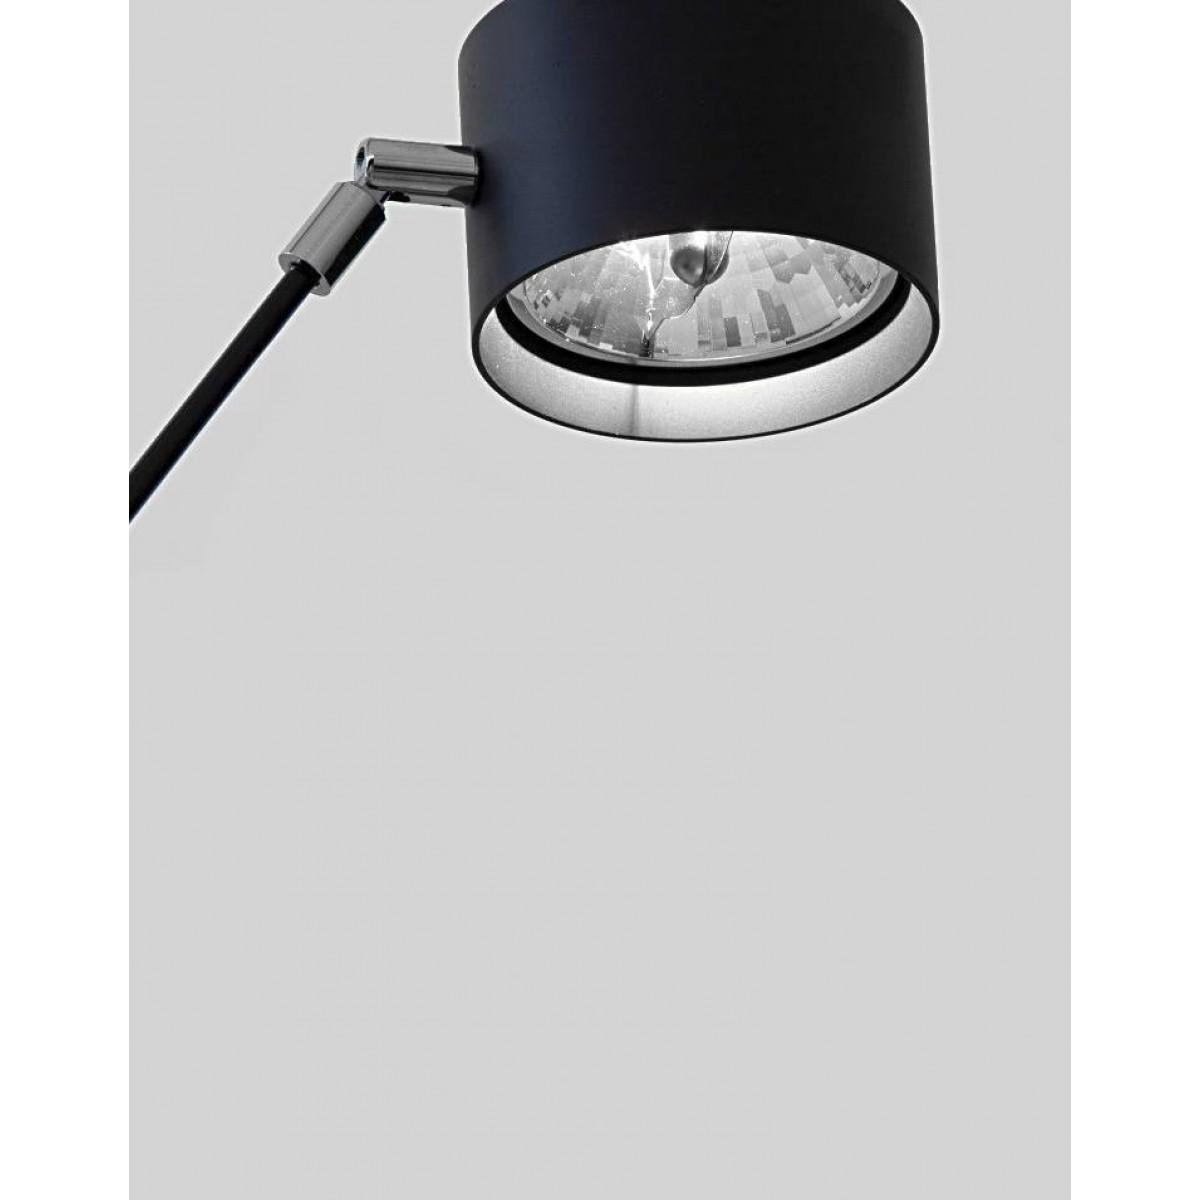 Davide Groppi Sampei 230 LED Lampada da terra per interni - Light41